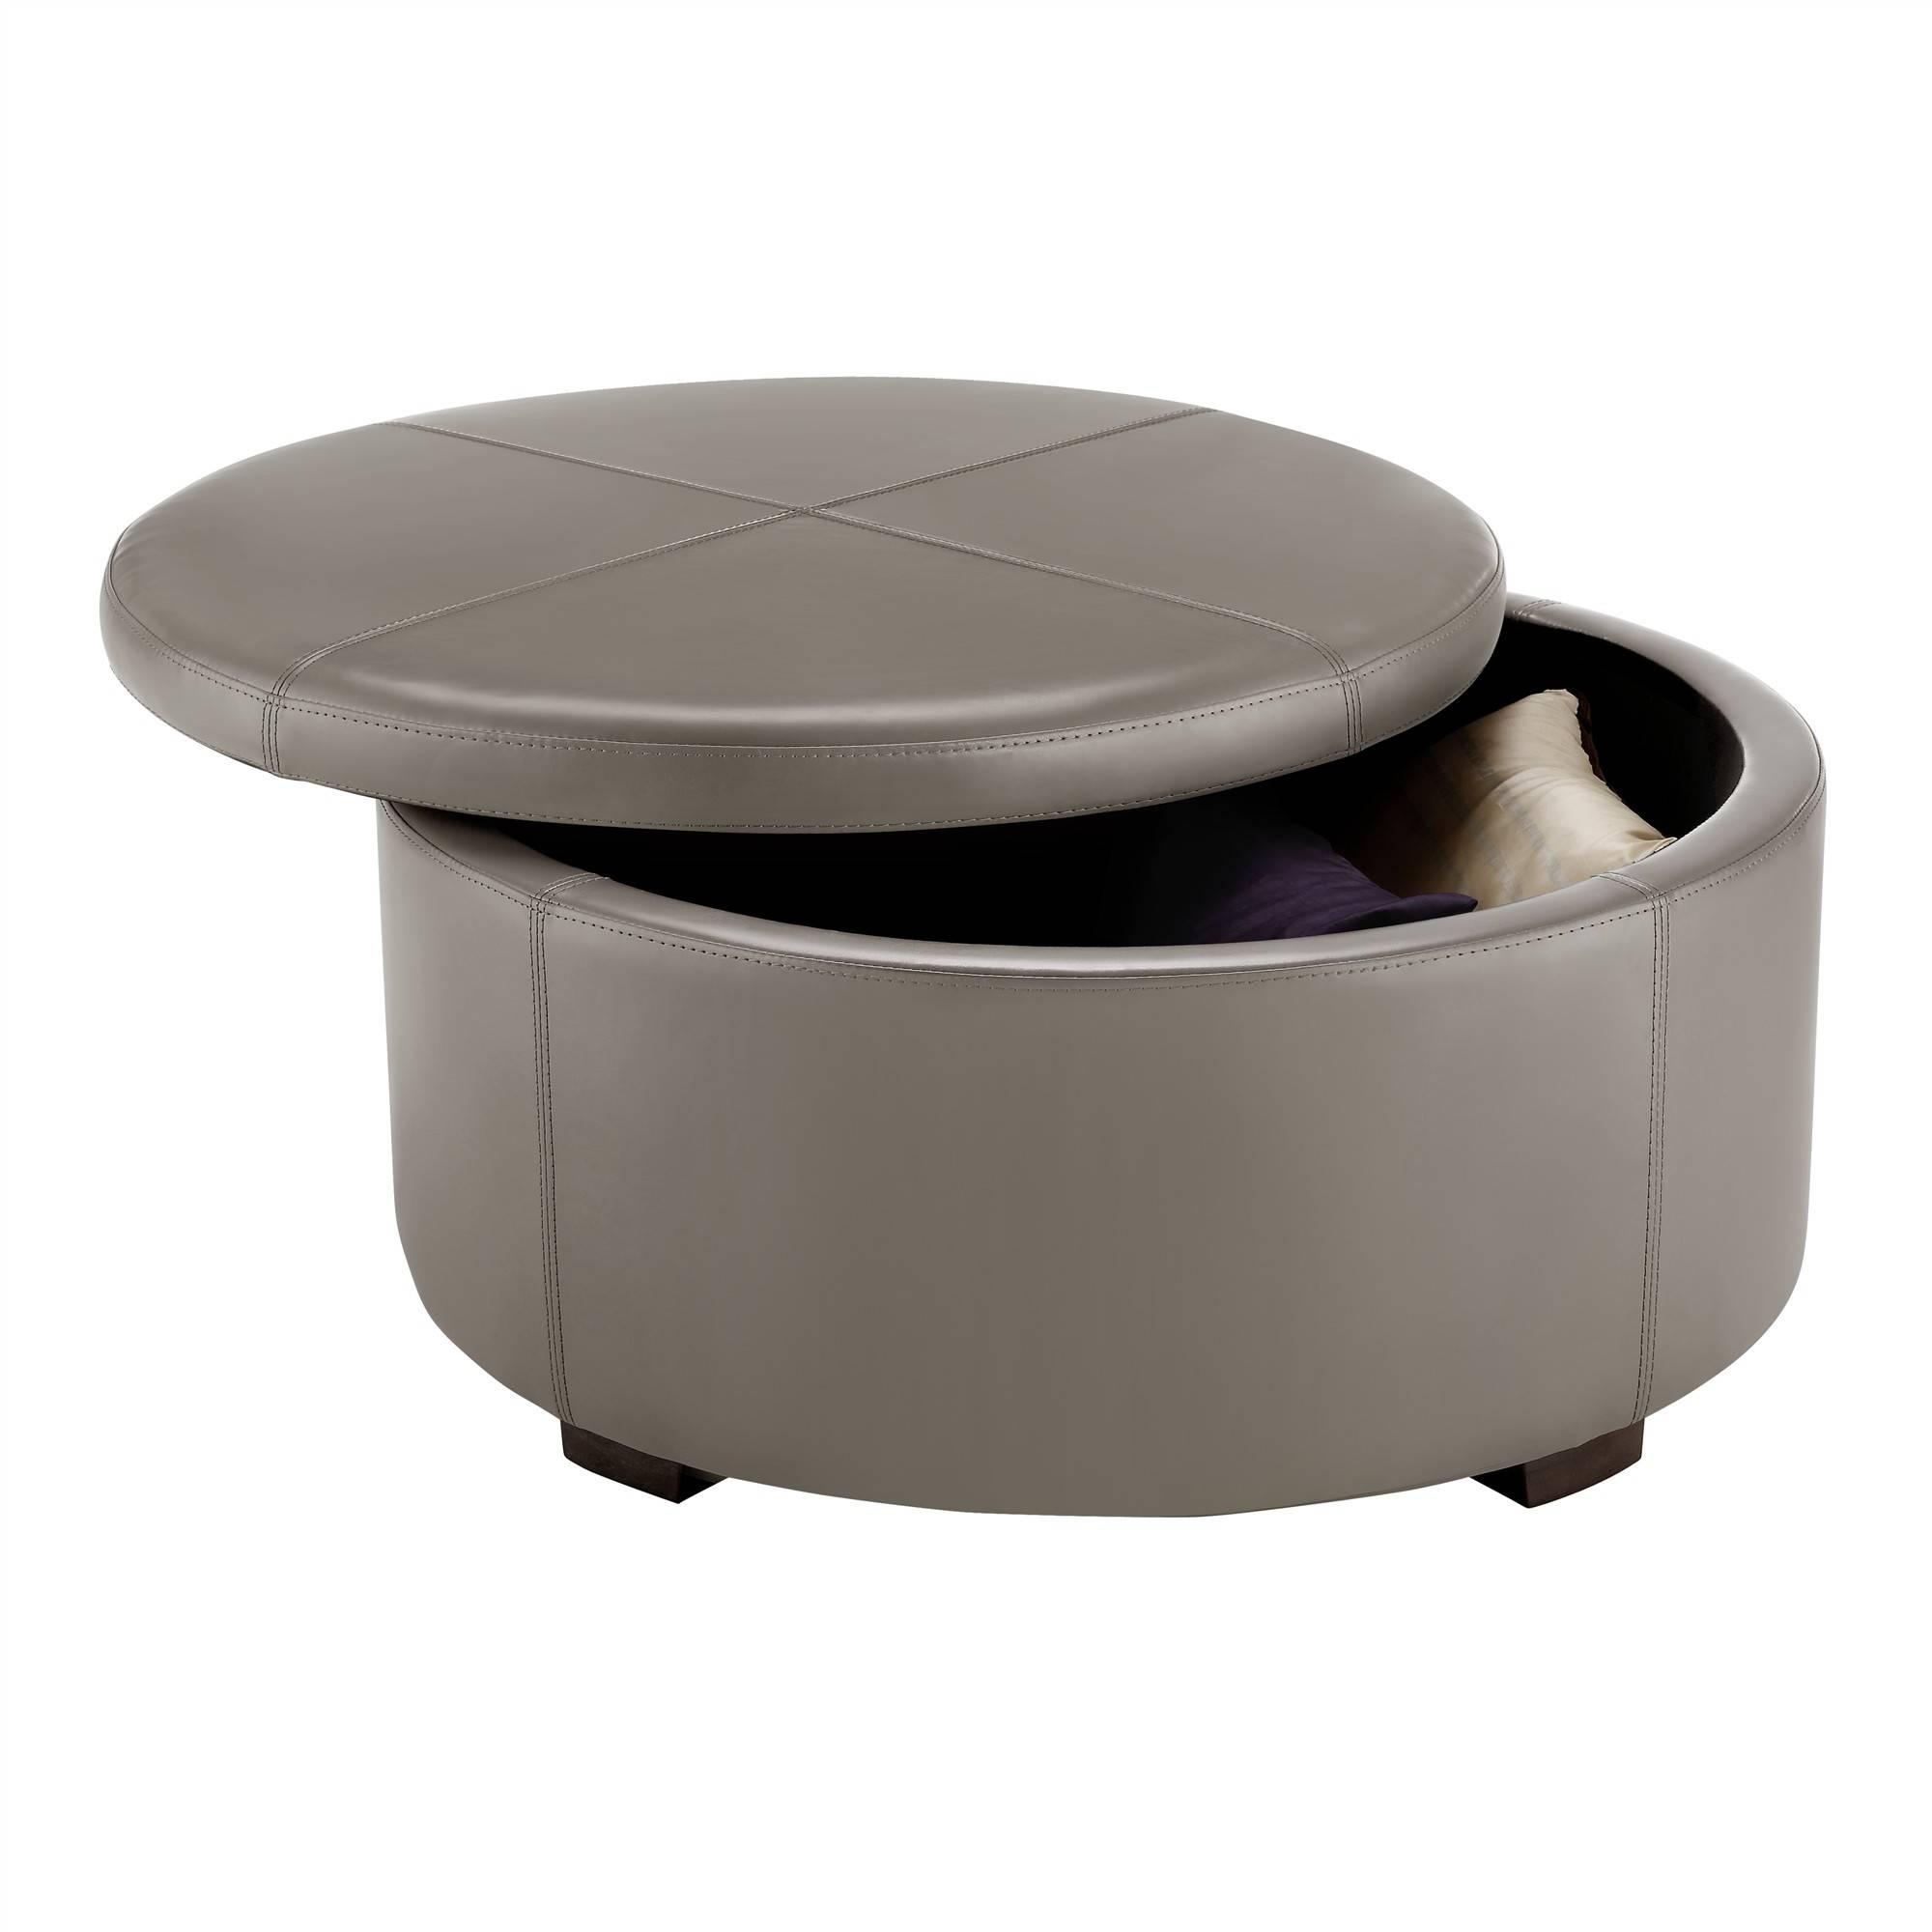 Modern Round Coffee Table. Coffee Tablemodern Round Black Glass inside Black Circle Coffee Tables (Image 21 of 30)